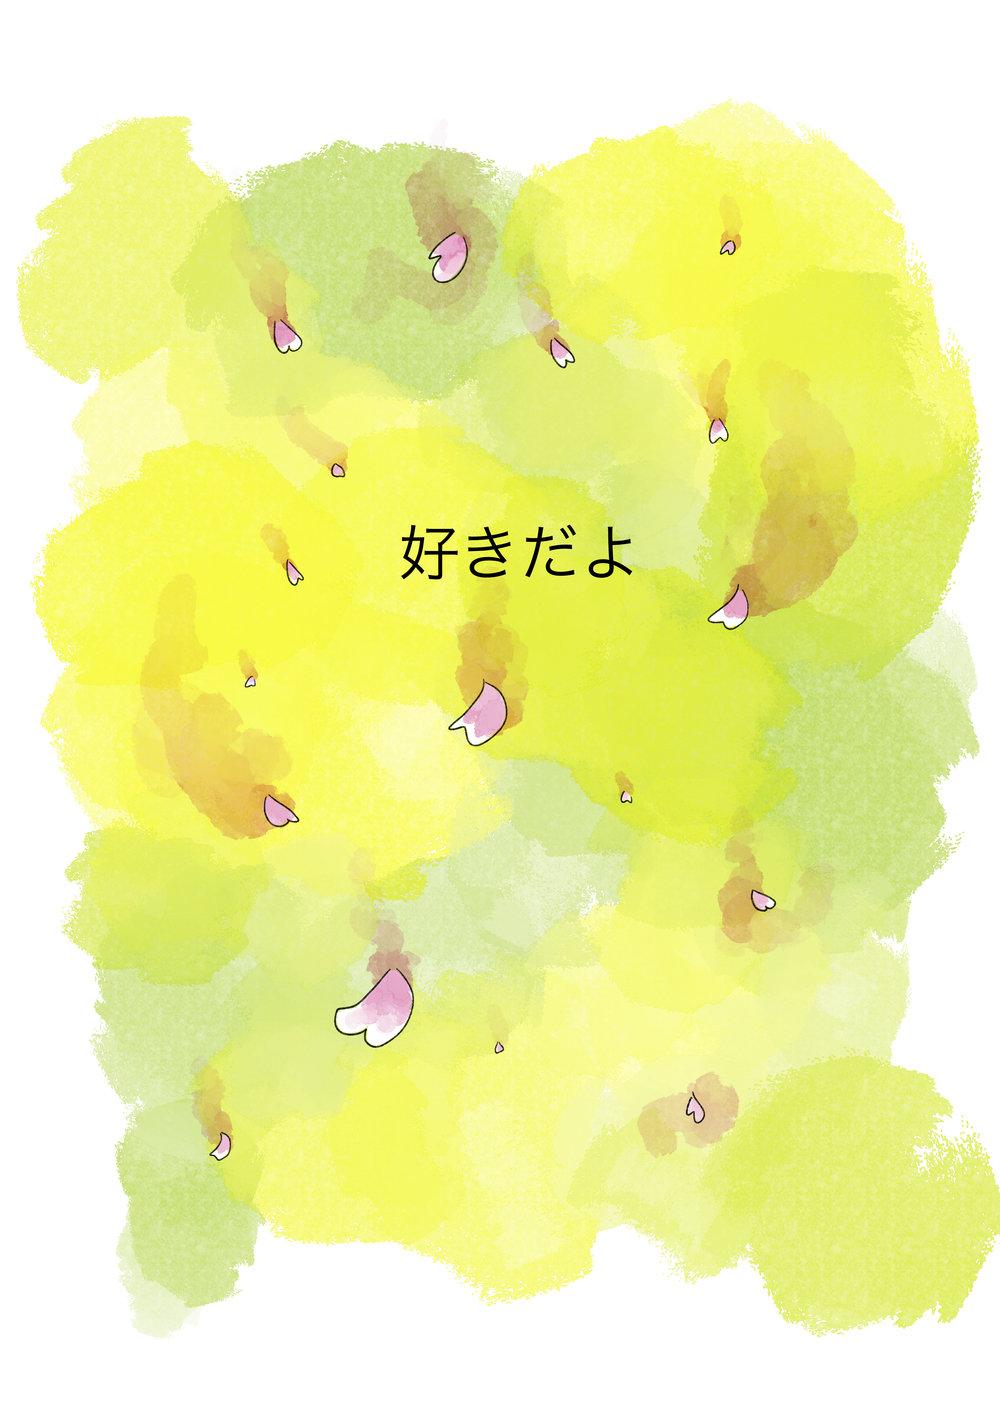 project_3_011.jpg